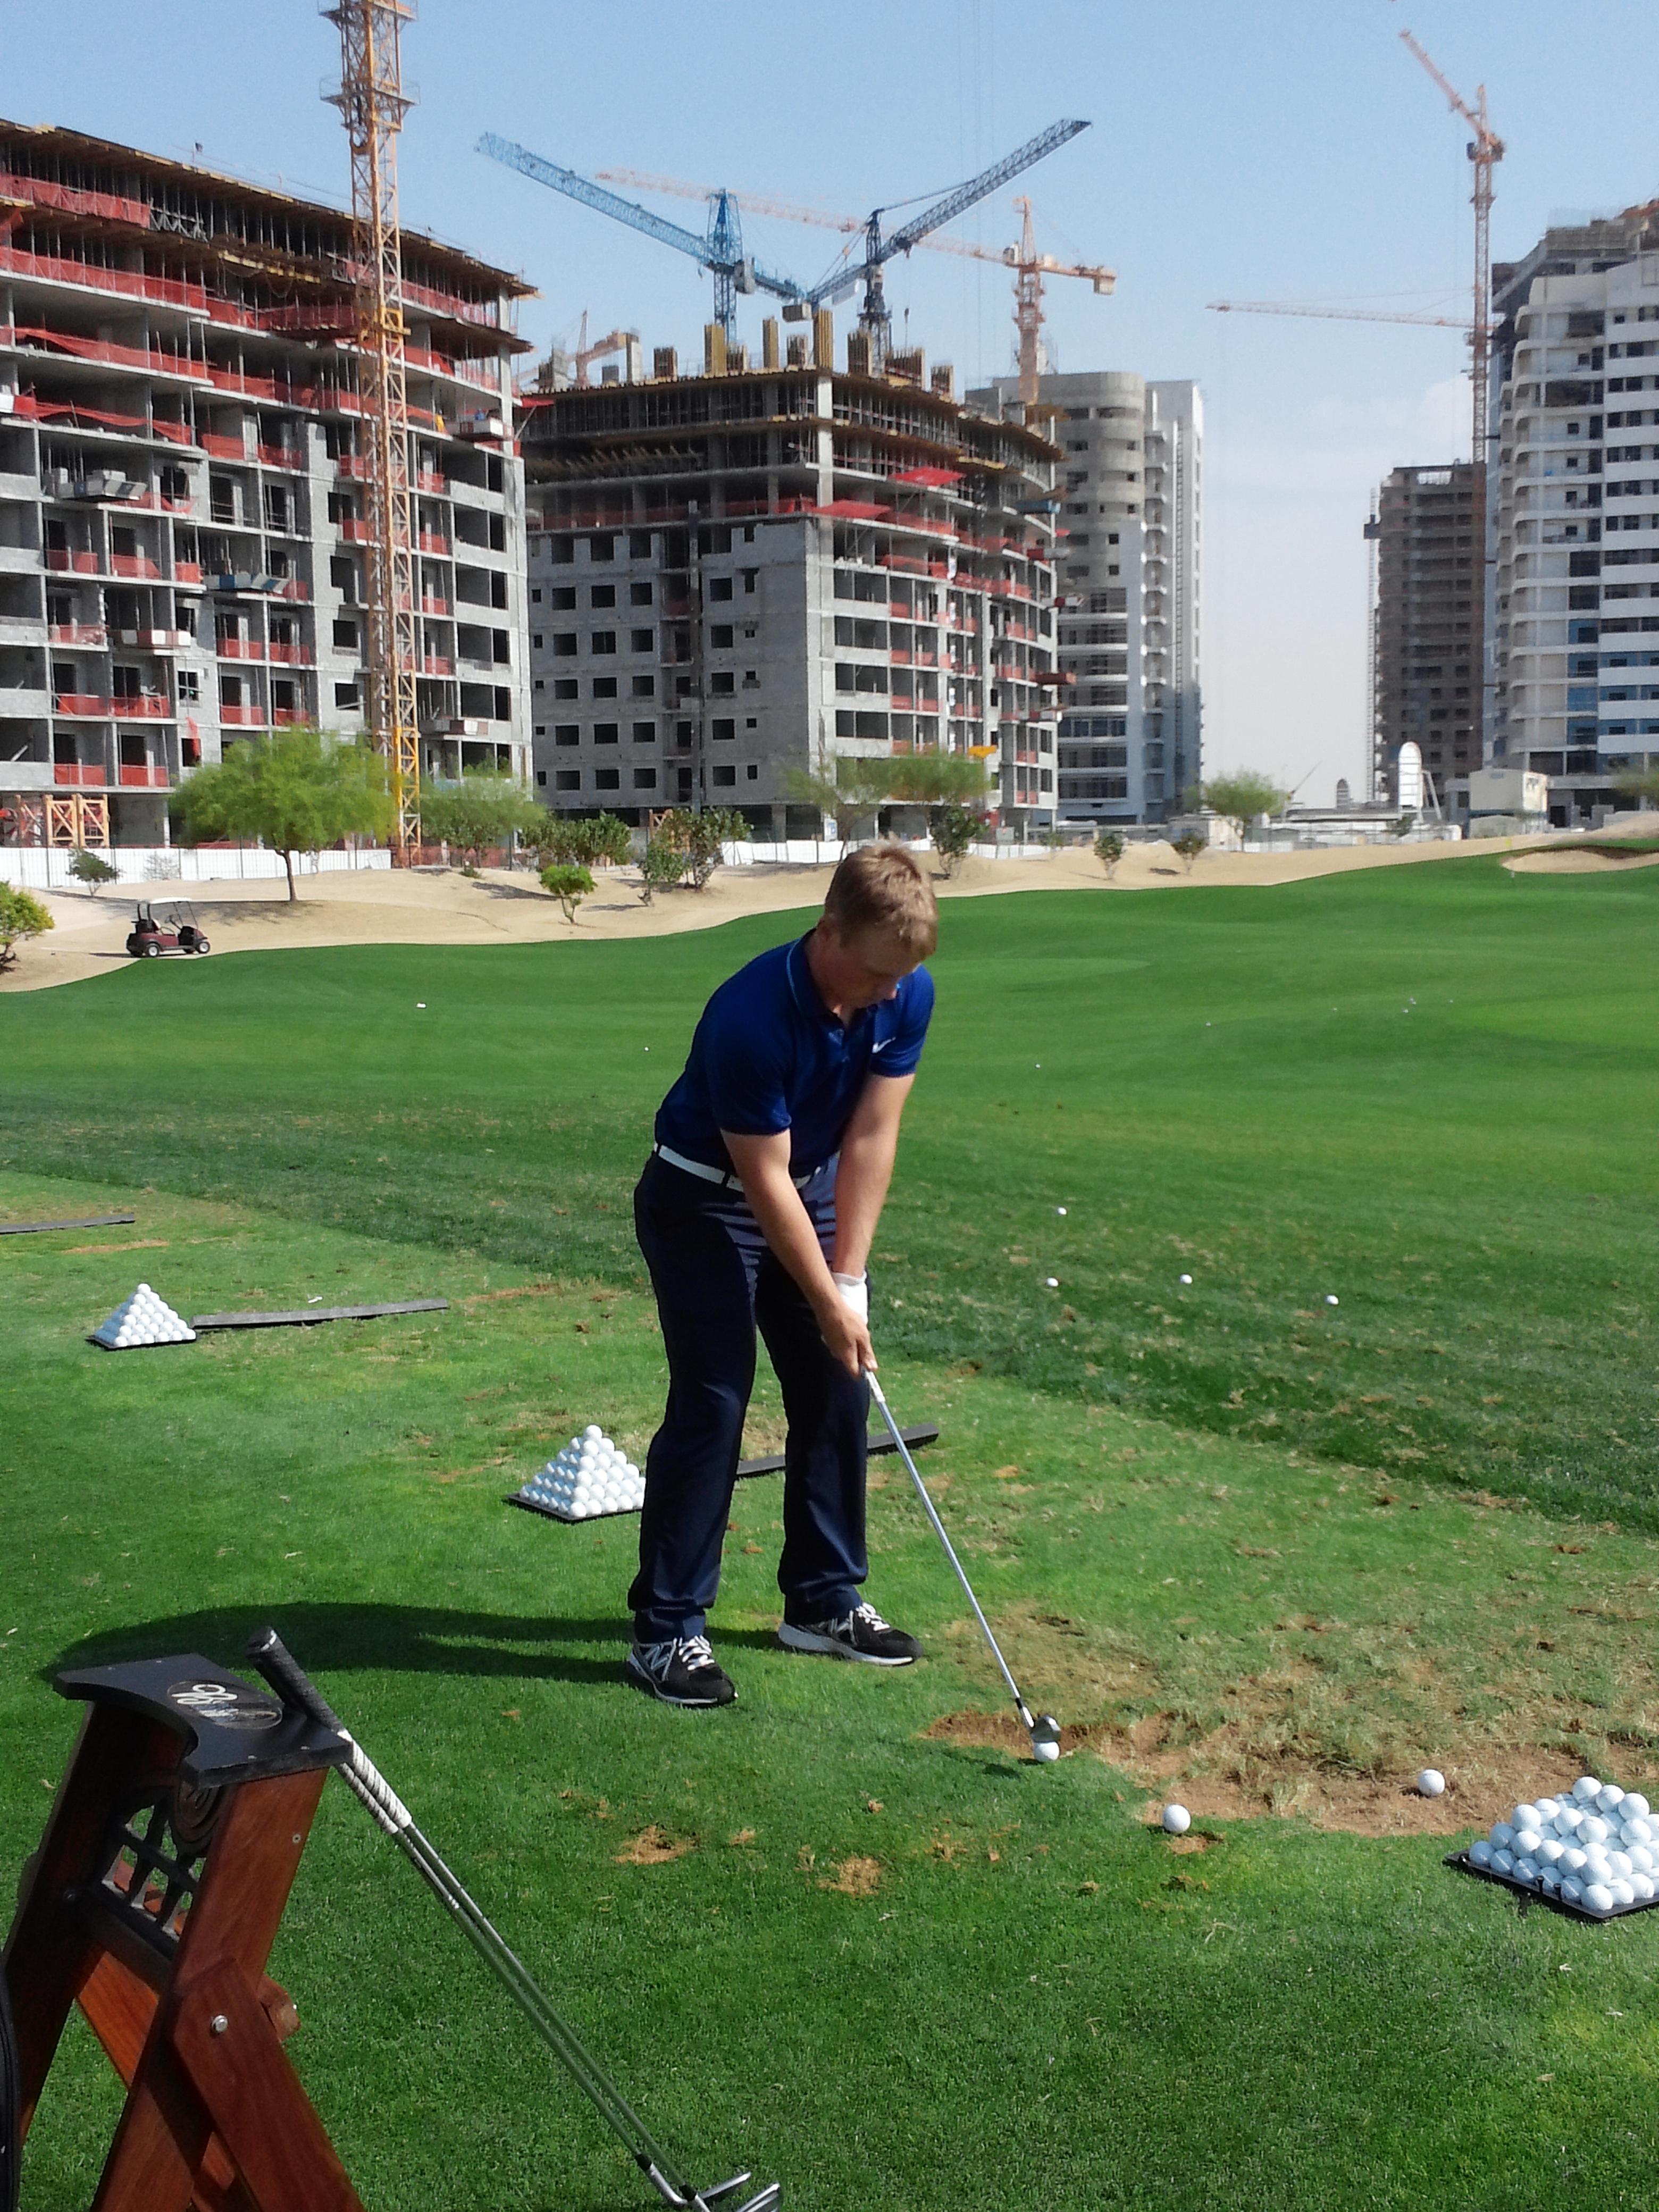 Brad Dalke practices at the Butch Harmon School of Golf in Dubai.